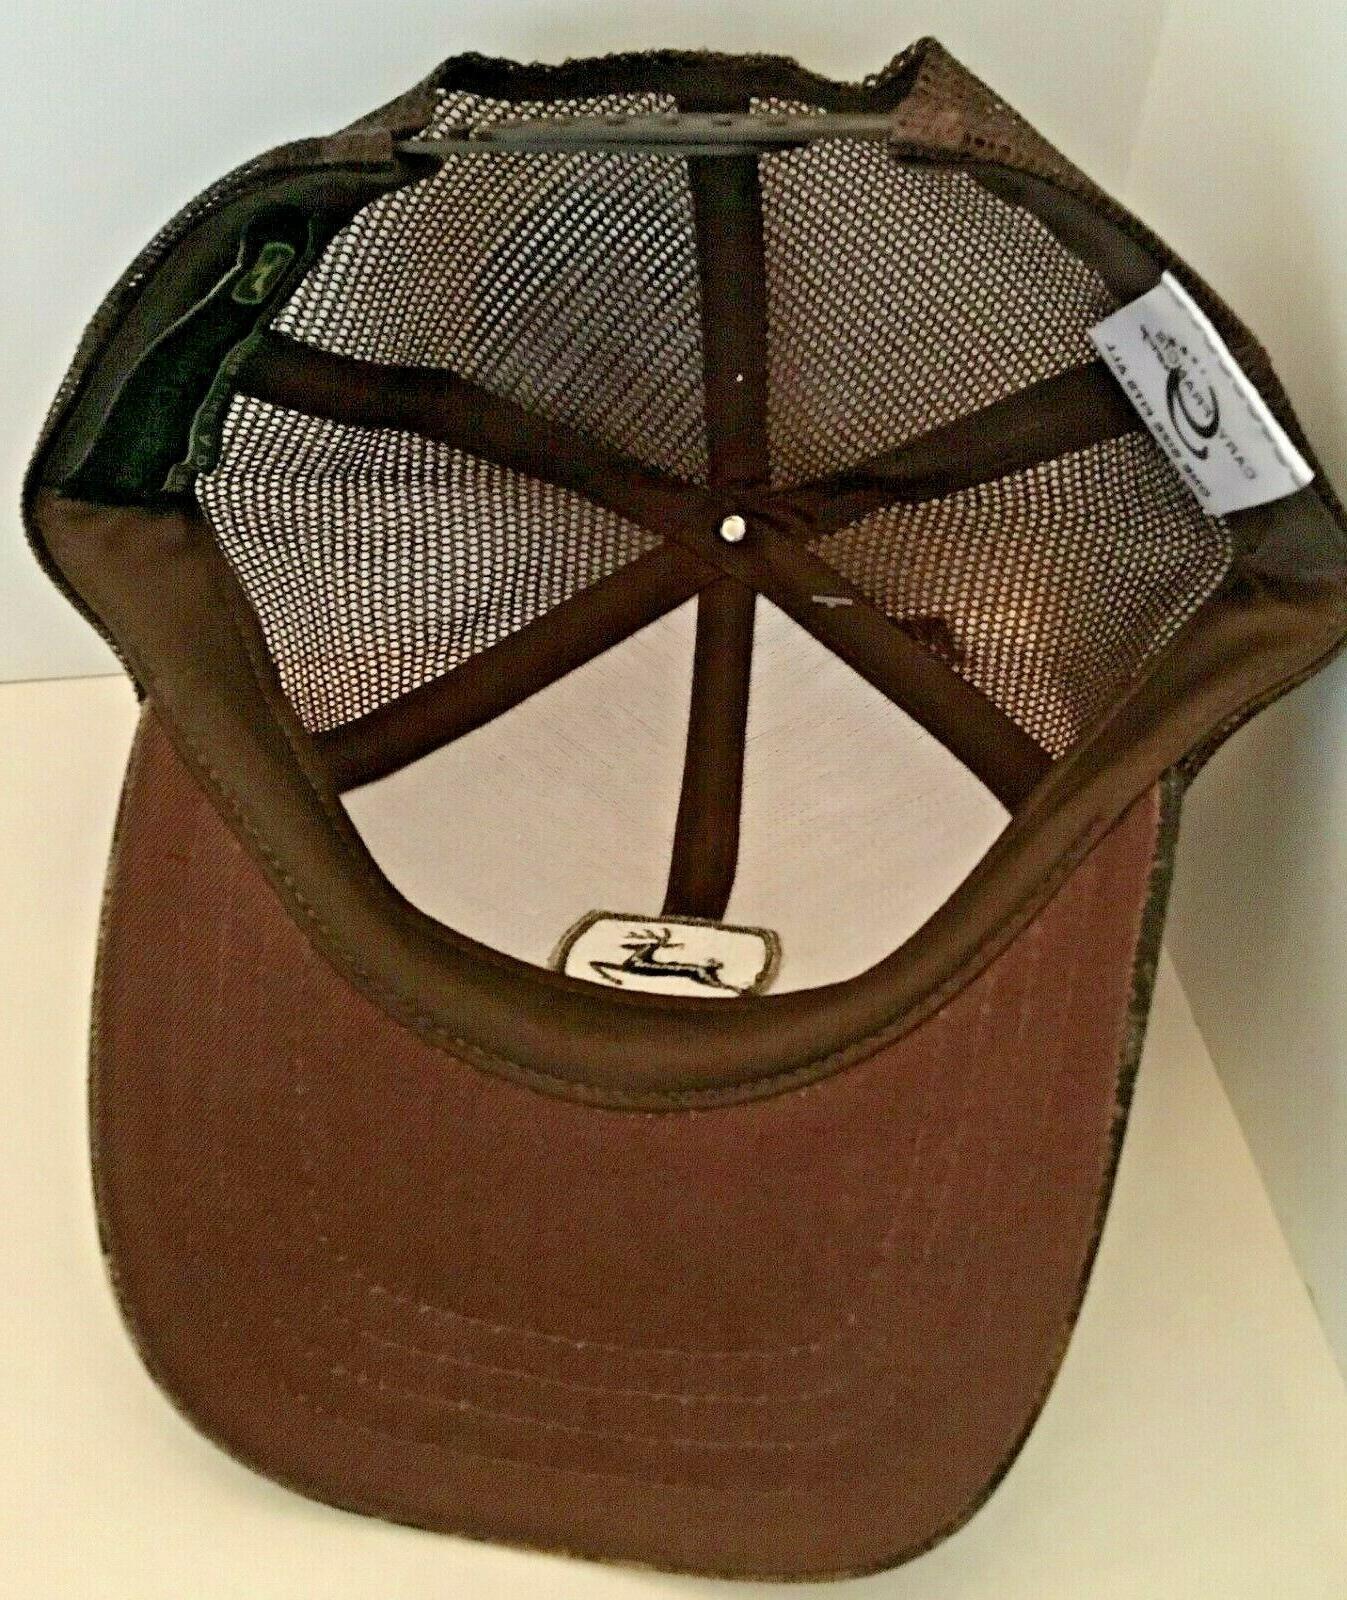 John Deere Brown / Green Trucker Mesh Snapback Hat